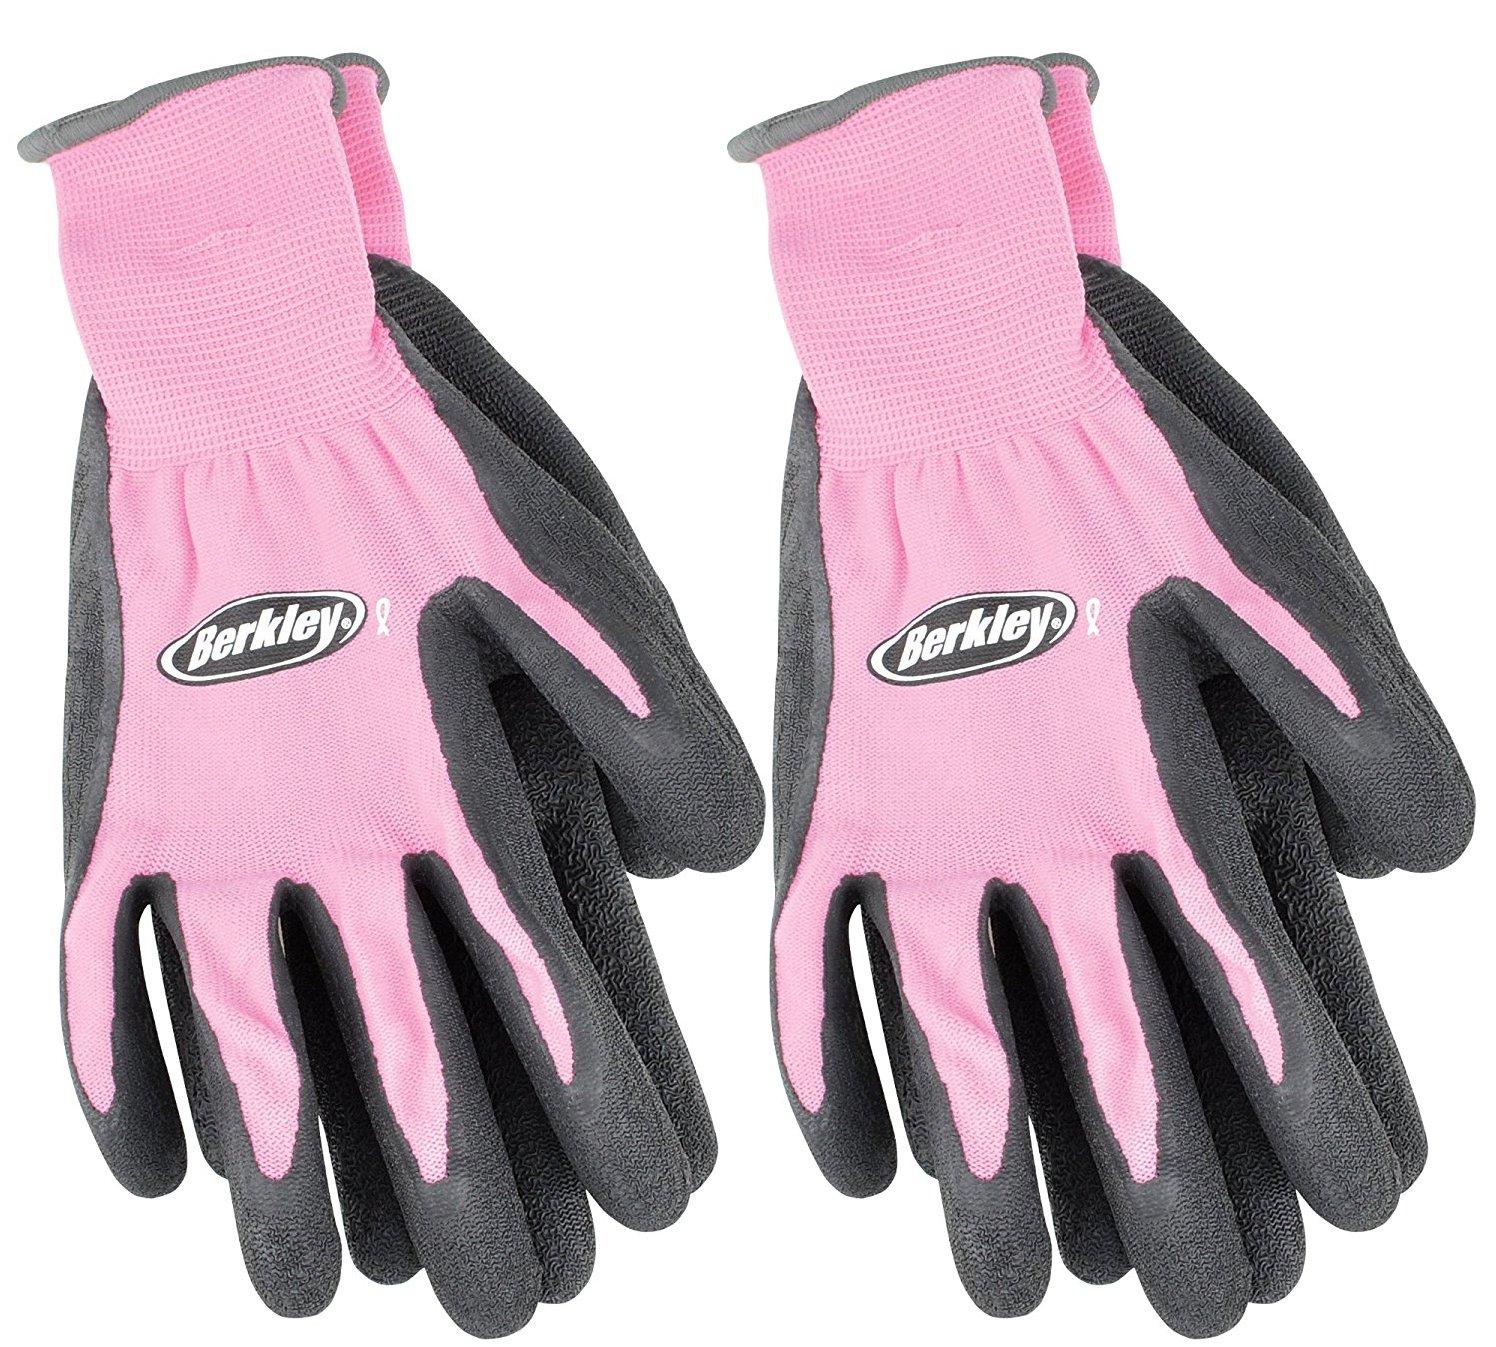 Berkley Fishing Gloves Combo Pack (Pink (2 Pack))